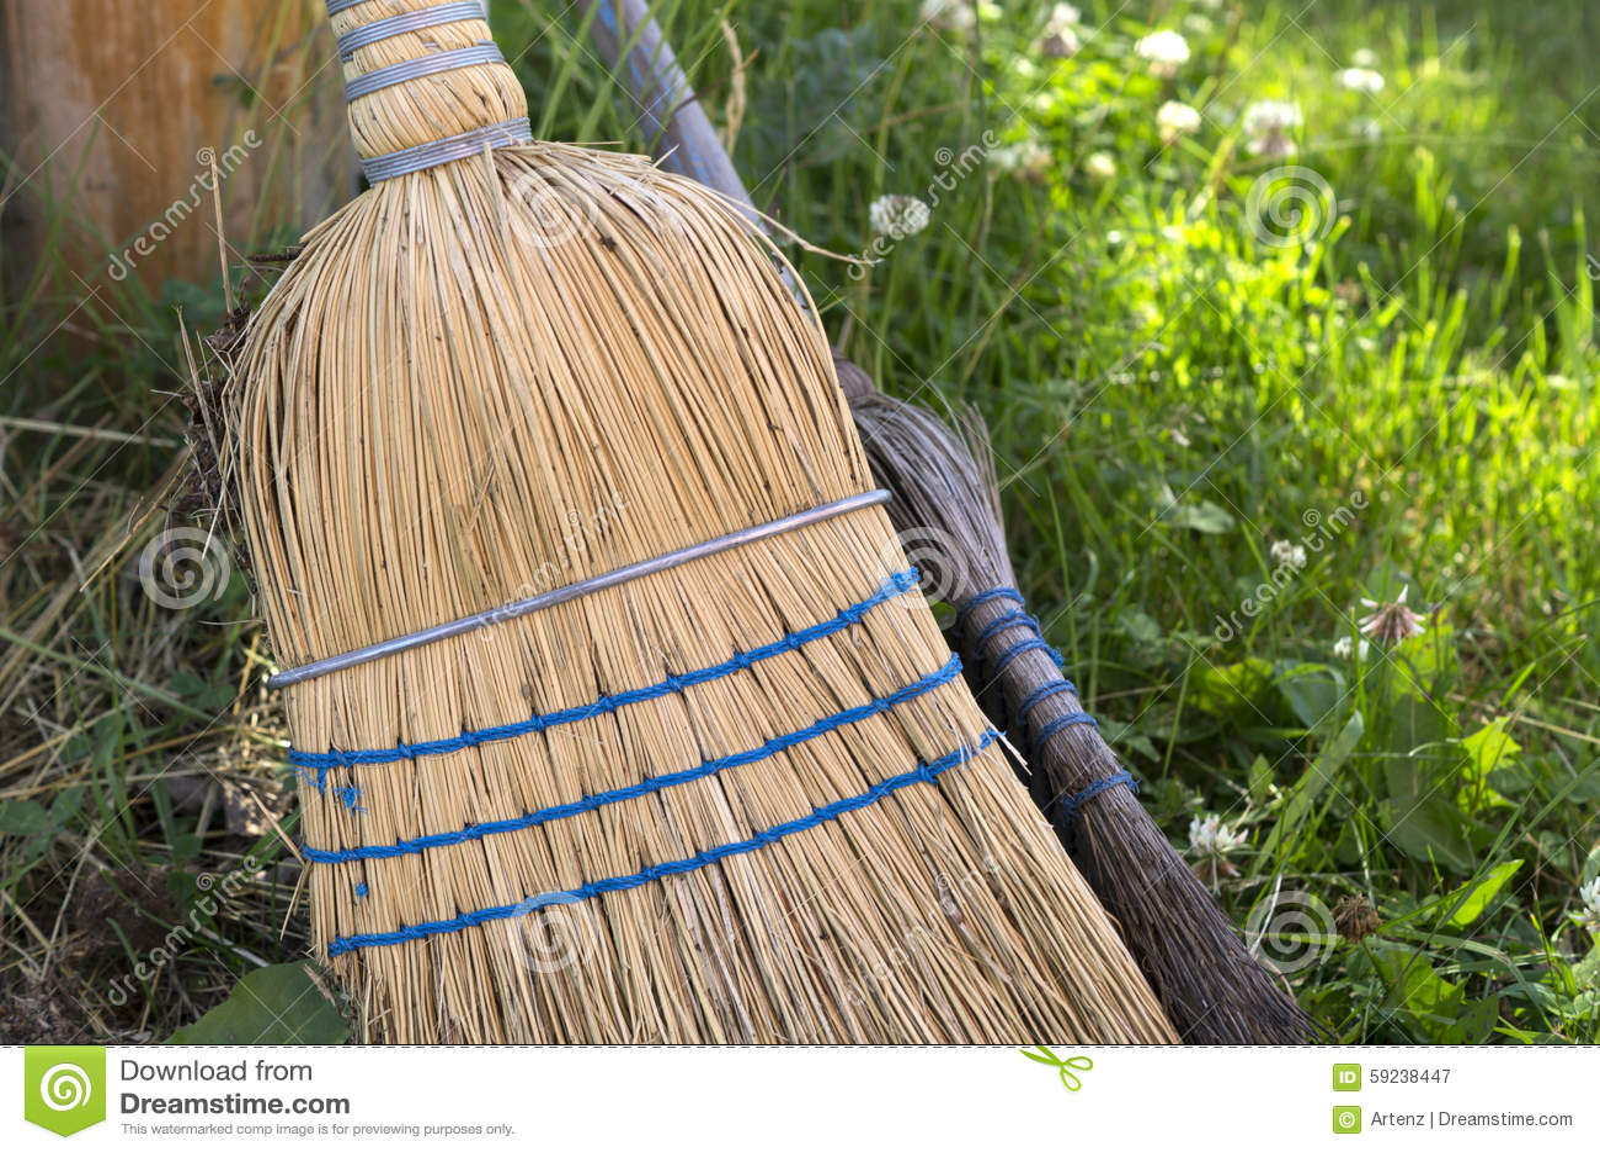 Straw Brooms